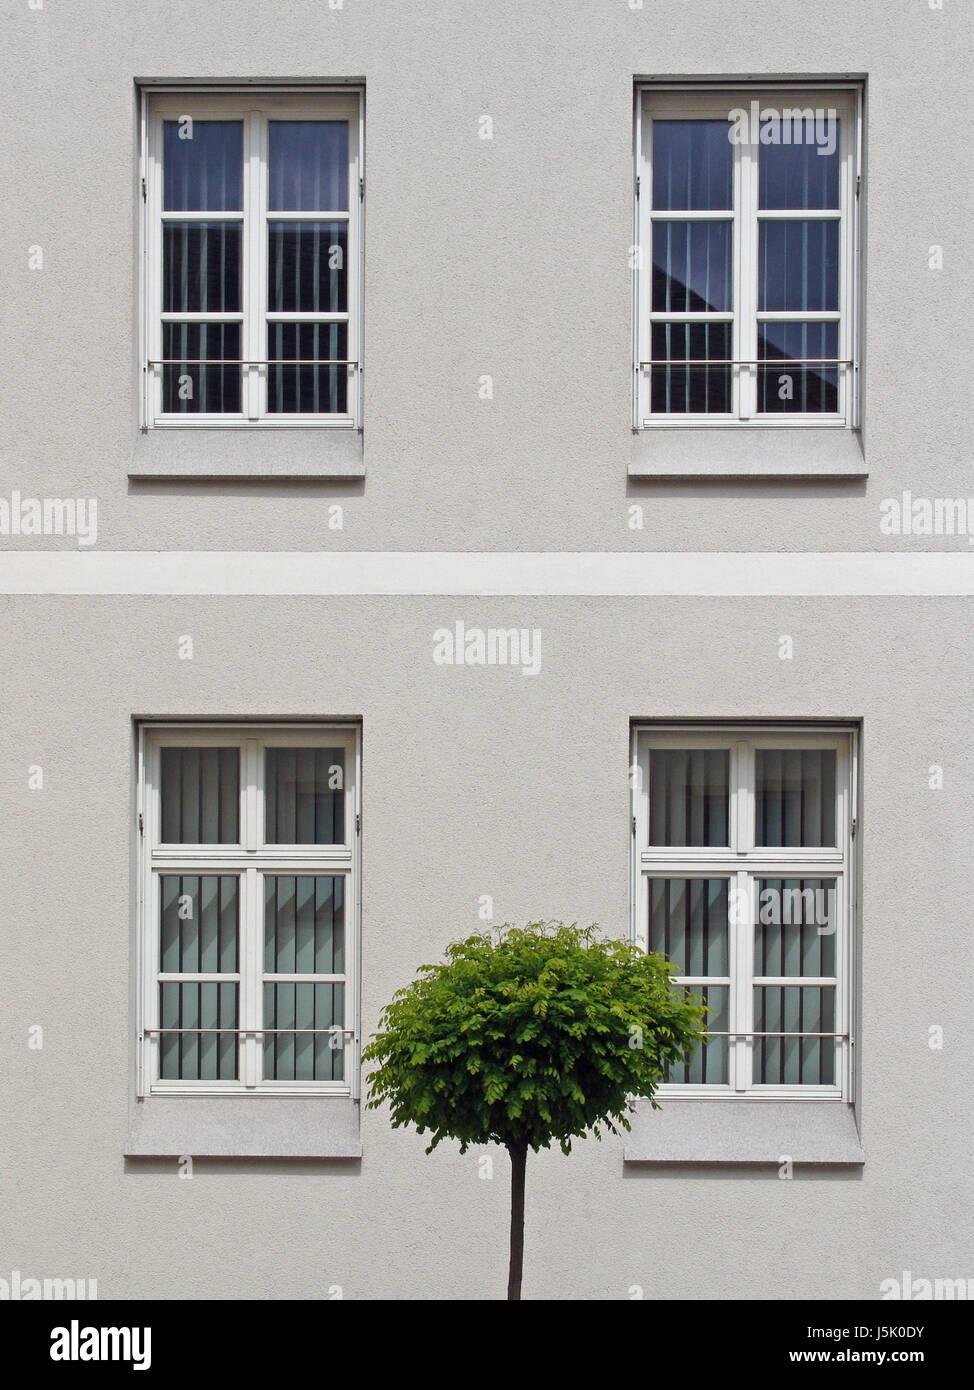 house building tree green window porthole dormer window pane sad facade dreary Stock Photo